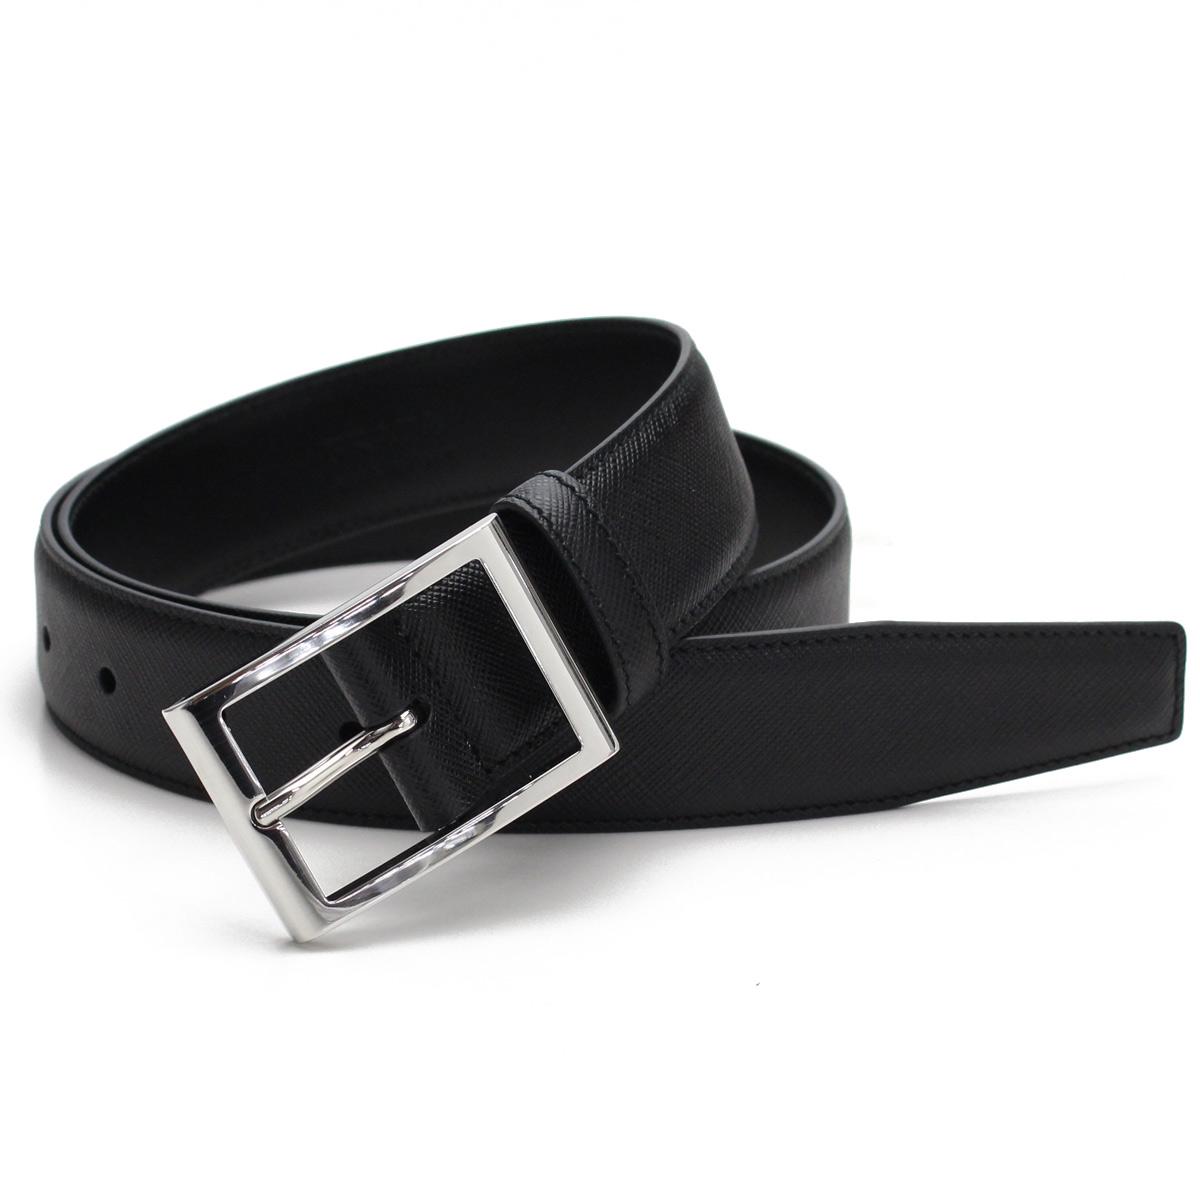 feb9708e152c8 Bighit The total brand wholesale: Prada PRADA men leather belt 2CC121 053  F0002 NERO black   Rakuten Global Market